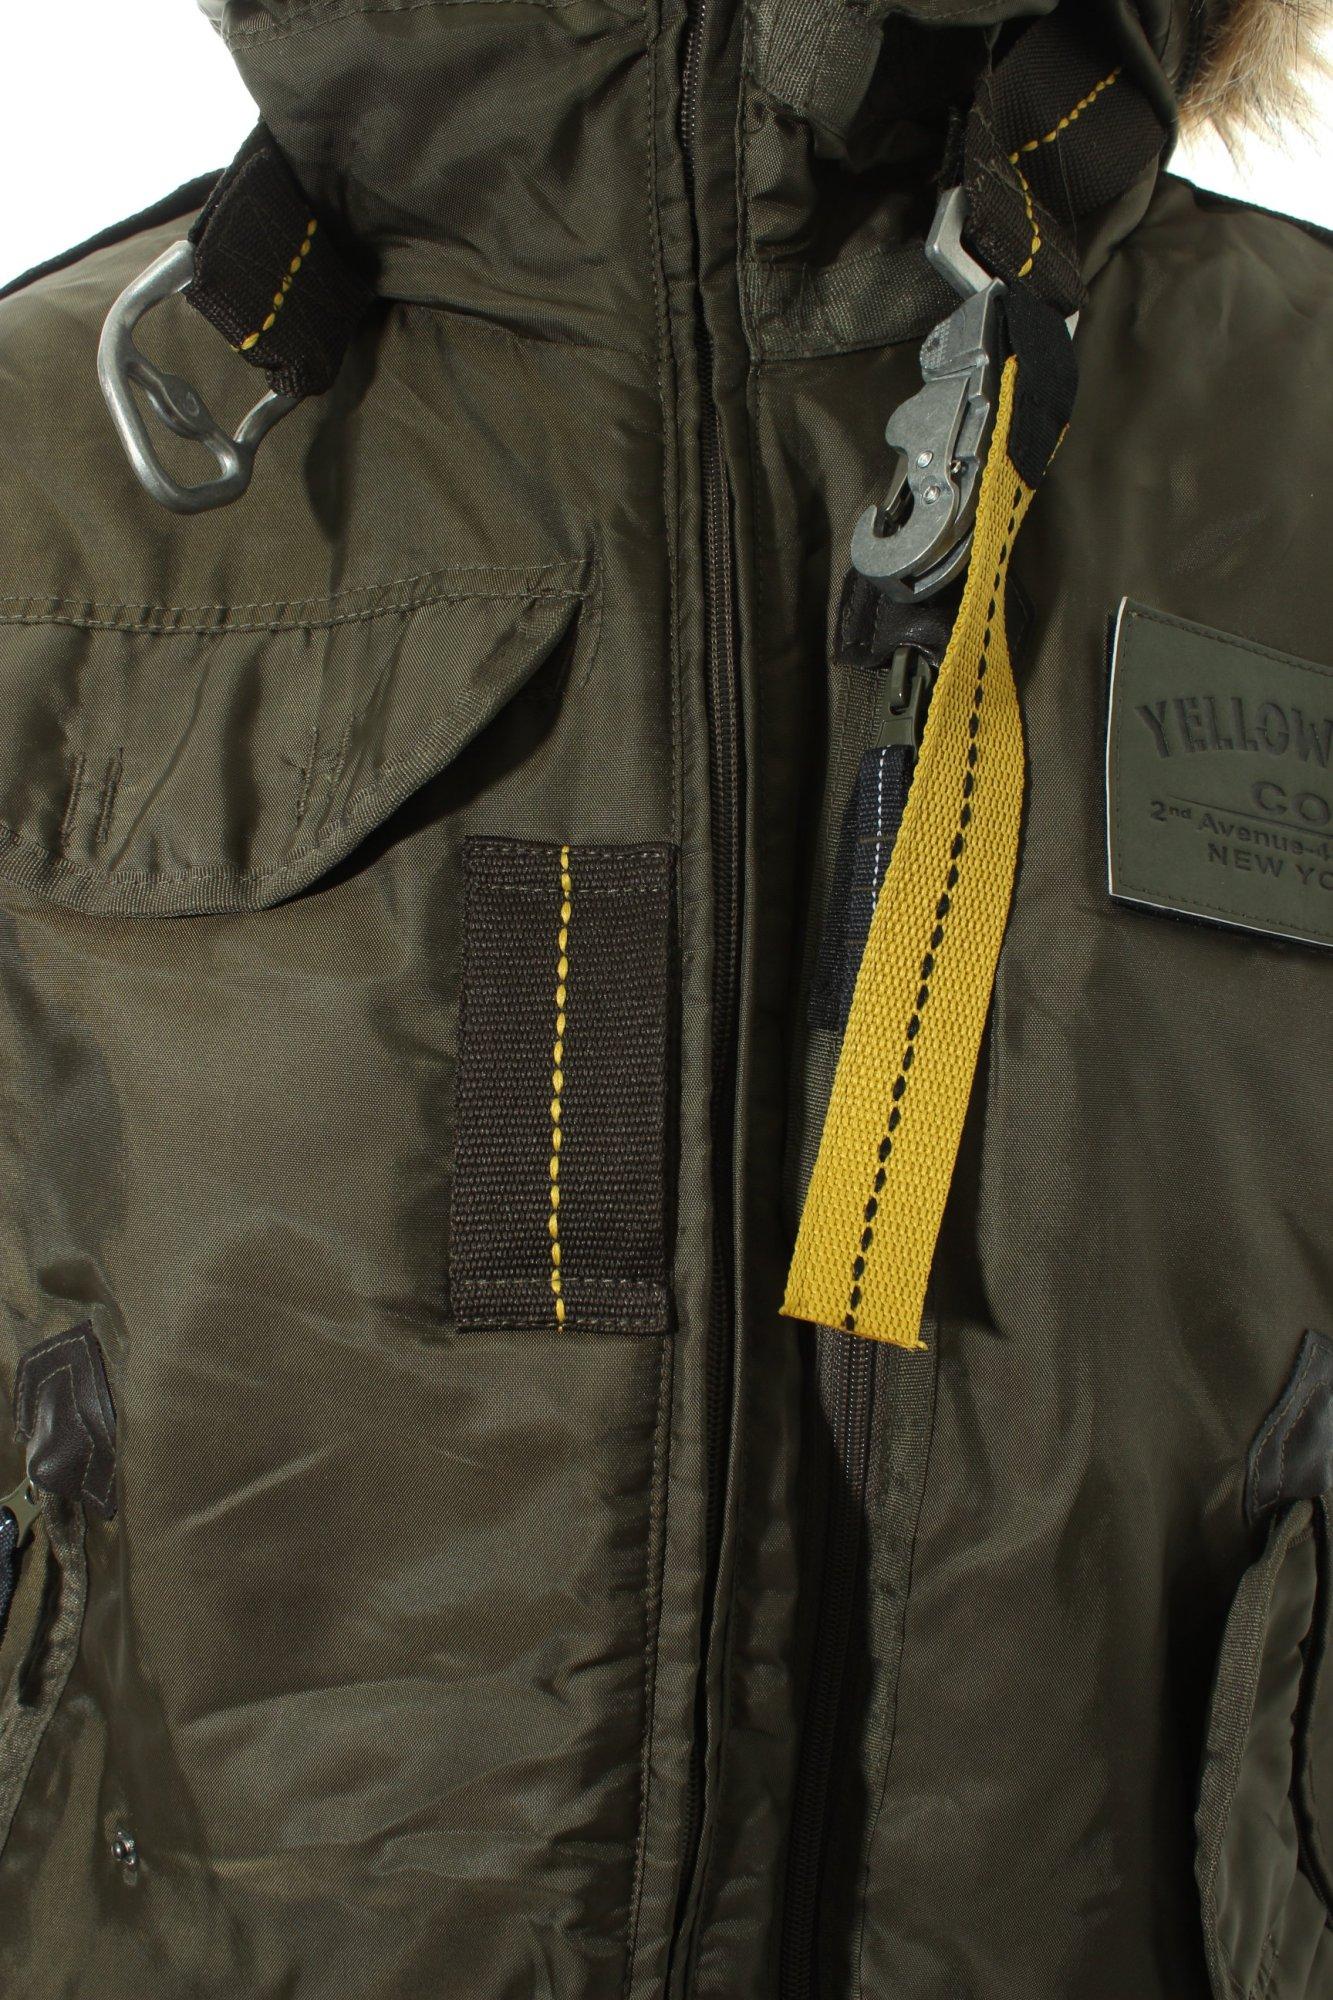 YELLOW-CAB-Chaqueta-militar-verde-oscuro-look-militar-Mujeres-Talla-EU-38